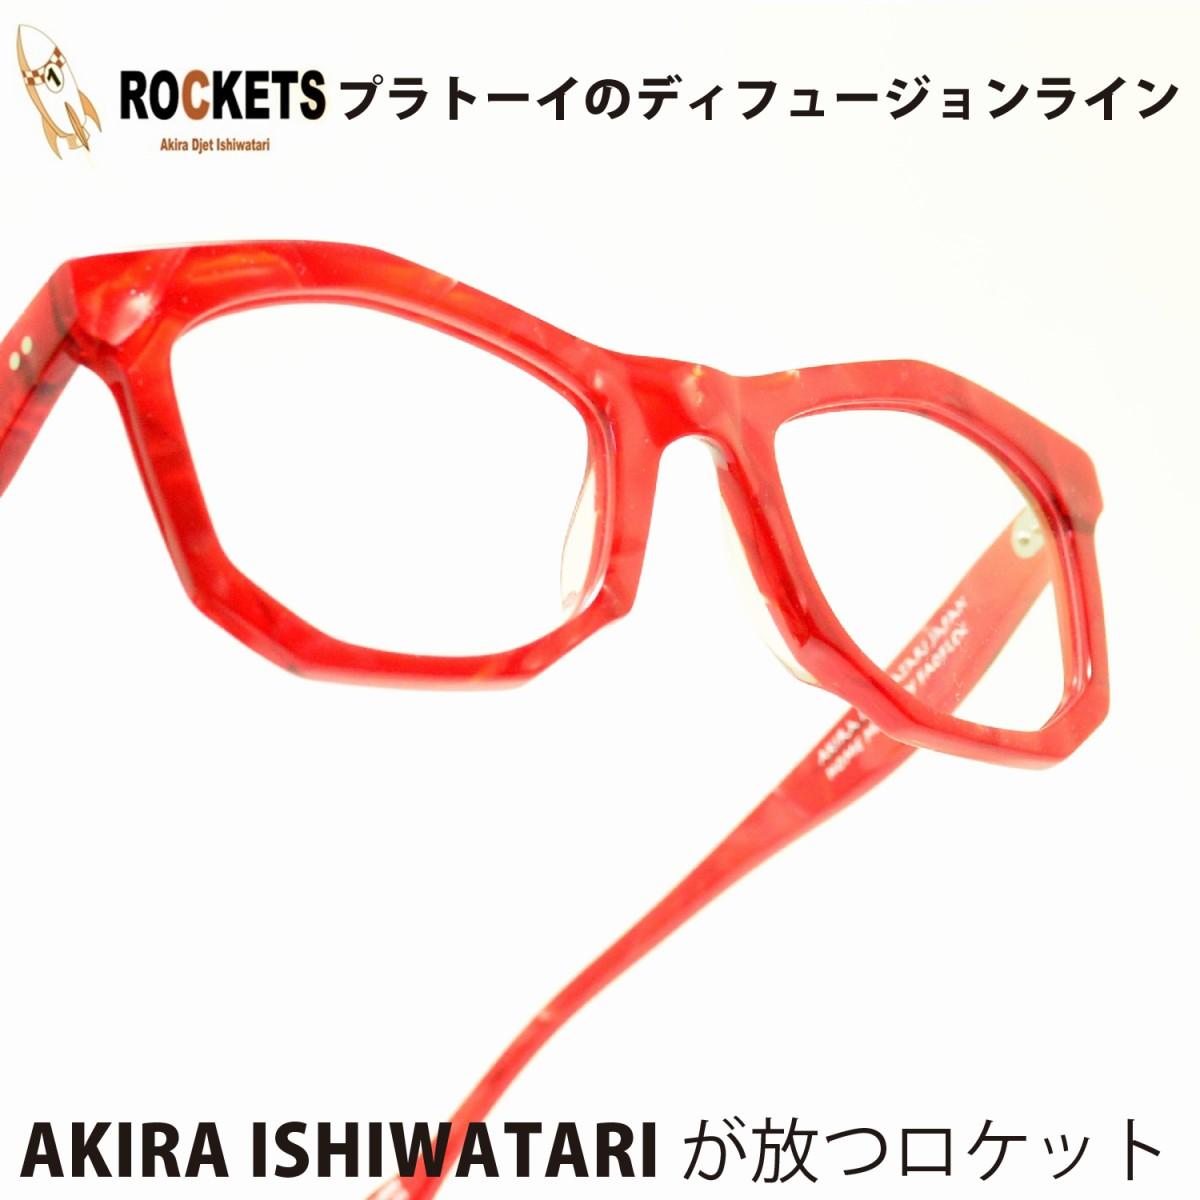 ROCKETS UTSUKE COL-BURNメガネ 眼鏡 めがね メンズ レディース おしゃれ ブランド 人気 おすすめ フレーム 流行り 度付き レンズ